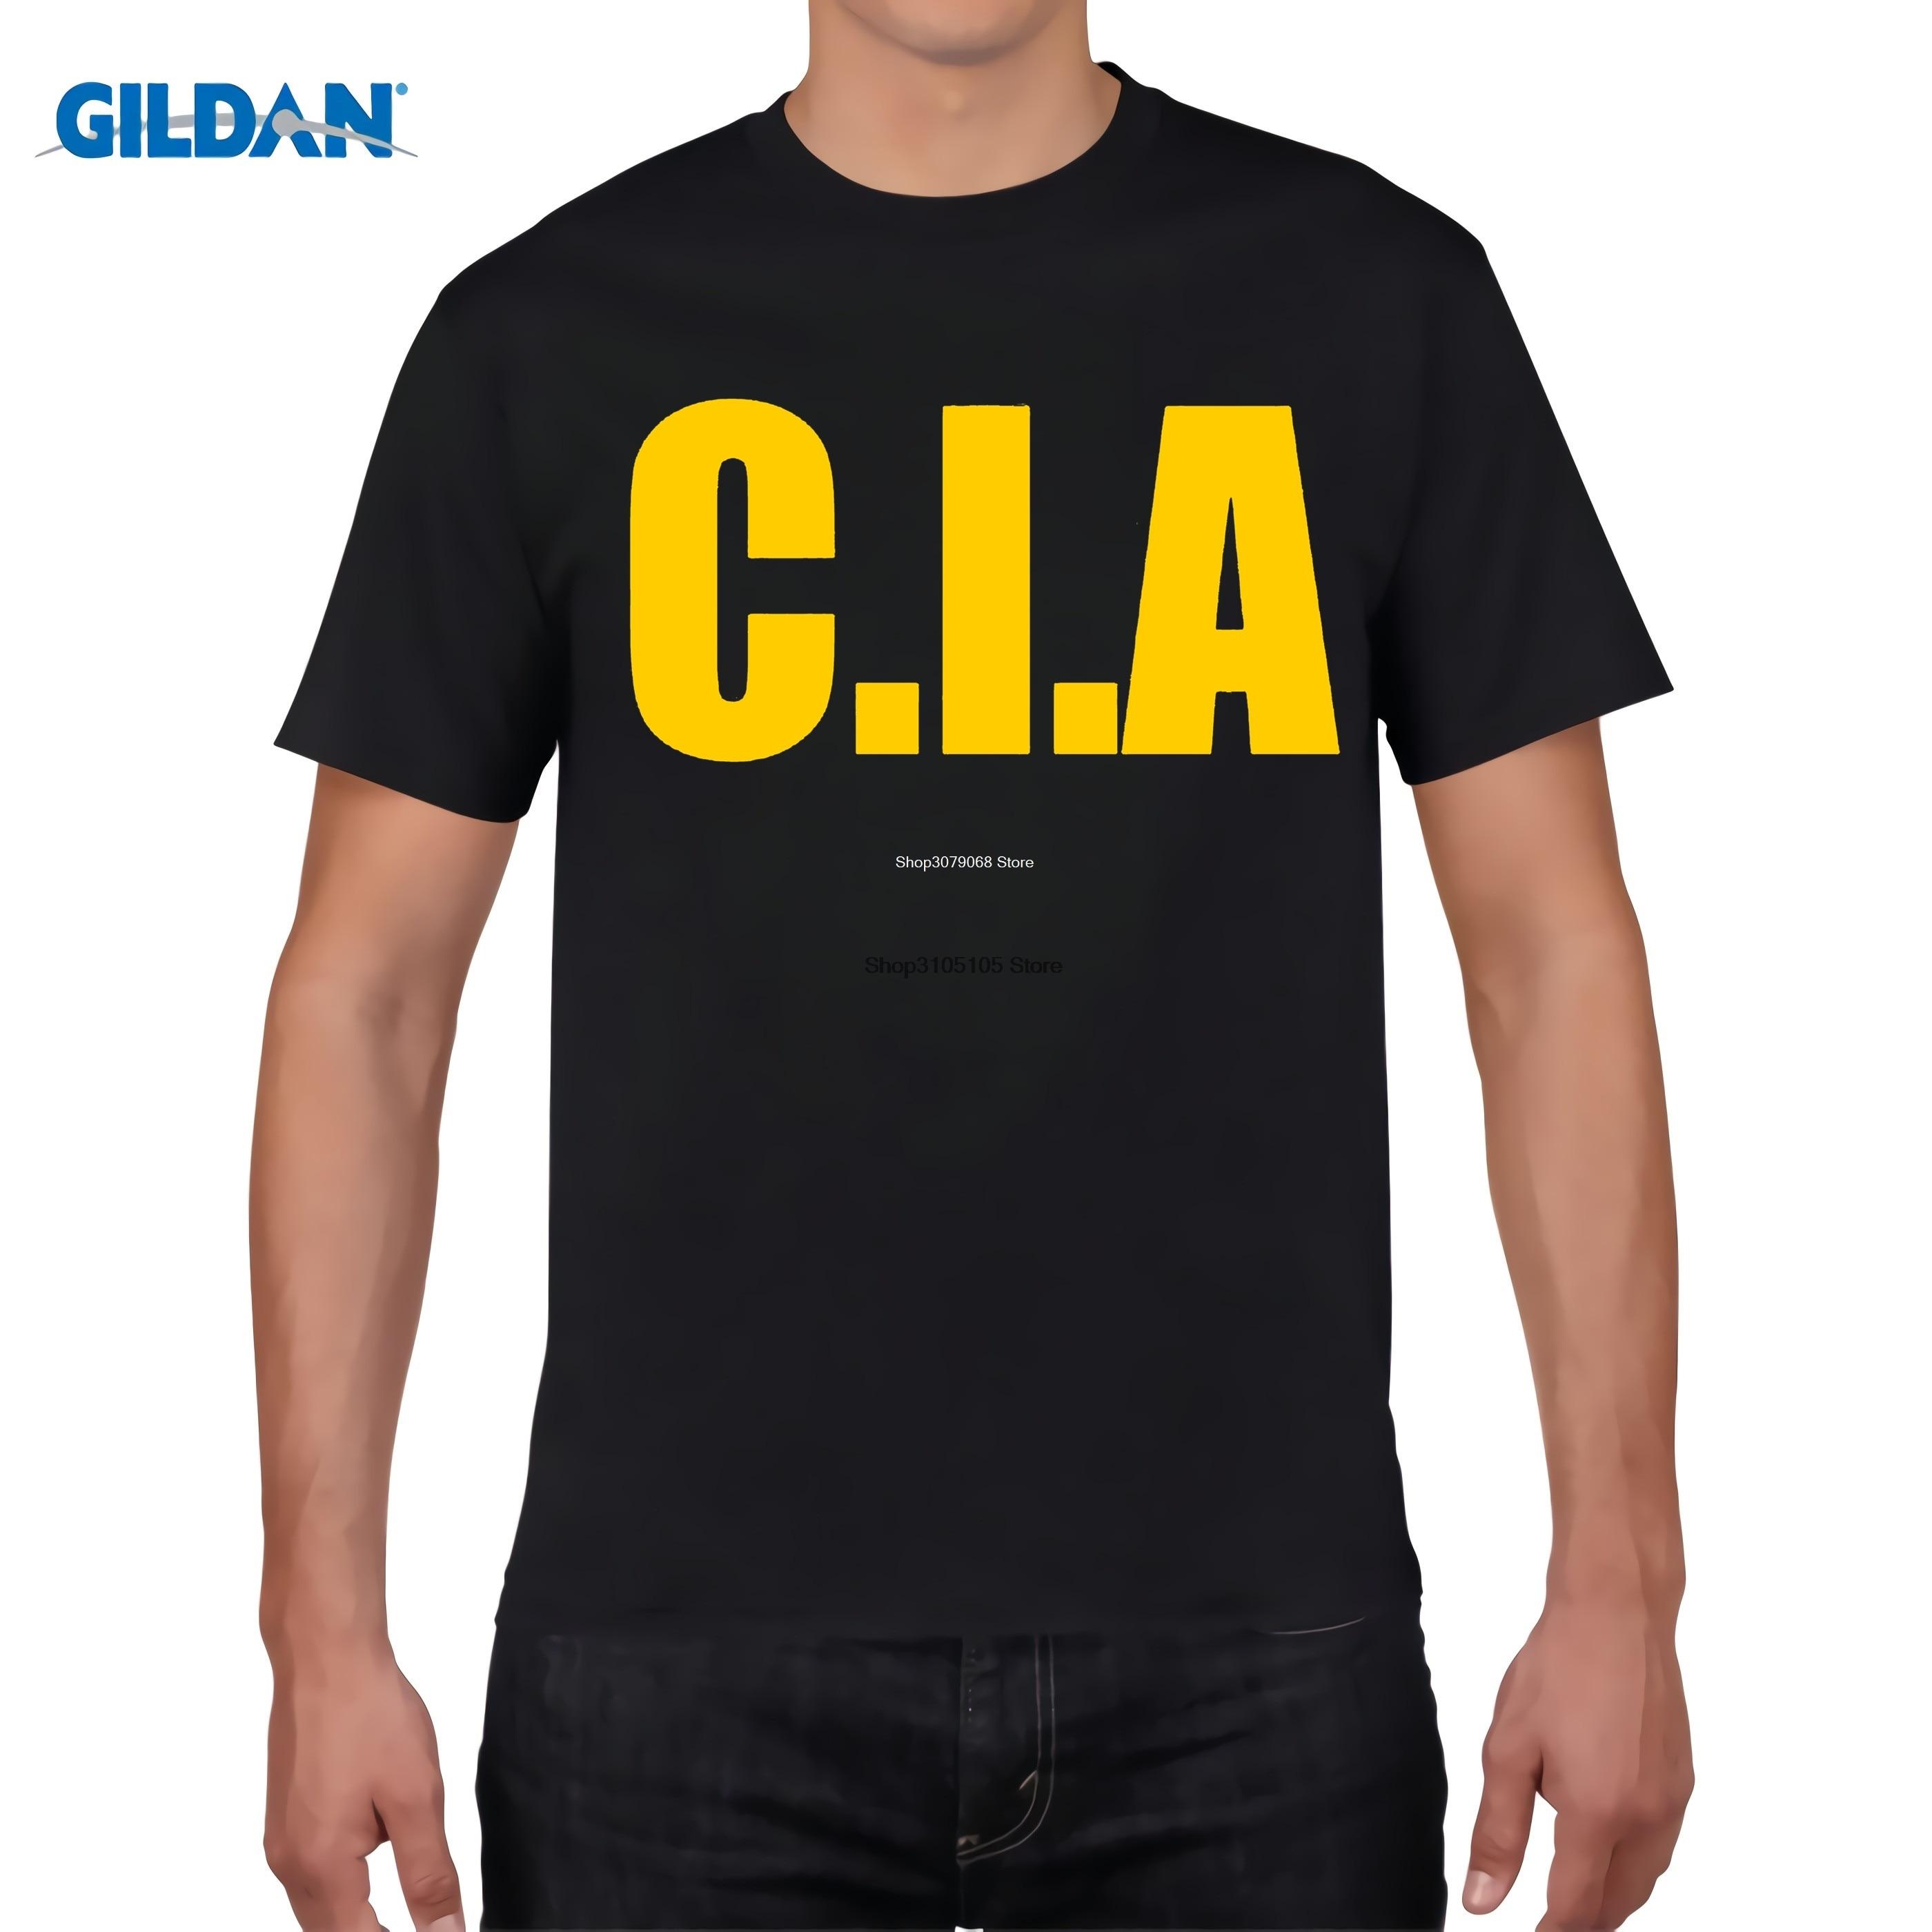 Danny zuko black t shirt - Gildan Designer T Shirt Novelty T Shirts Cia Tshirt Funny T Shirt Criminal Retro